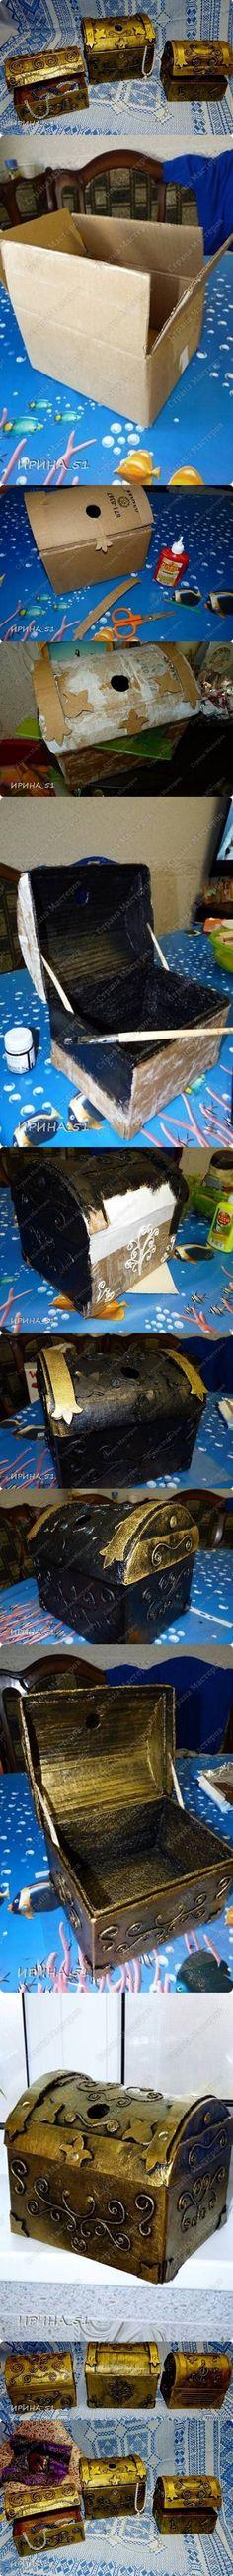 DIY Cardboard Jewelry Treasure Box DIY Projects